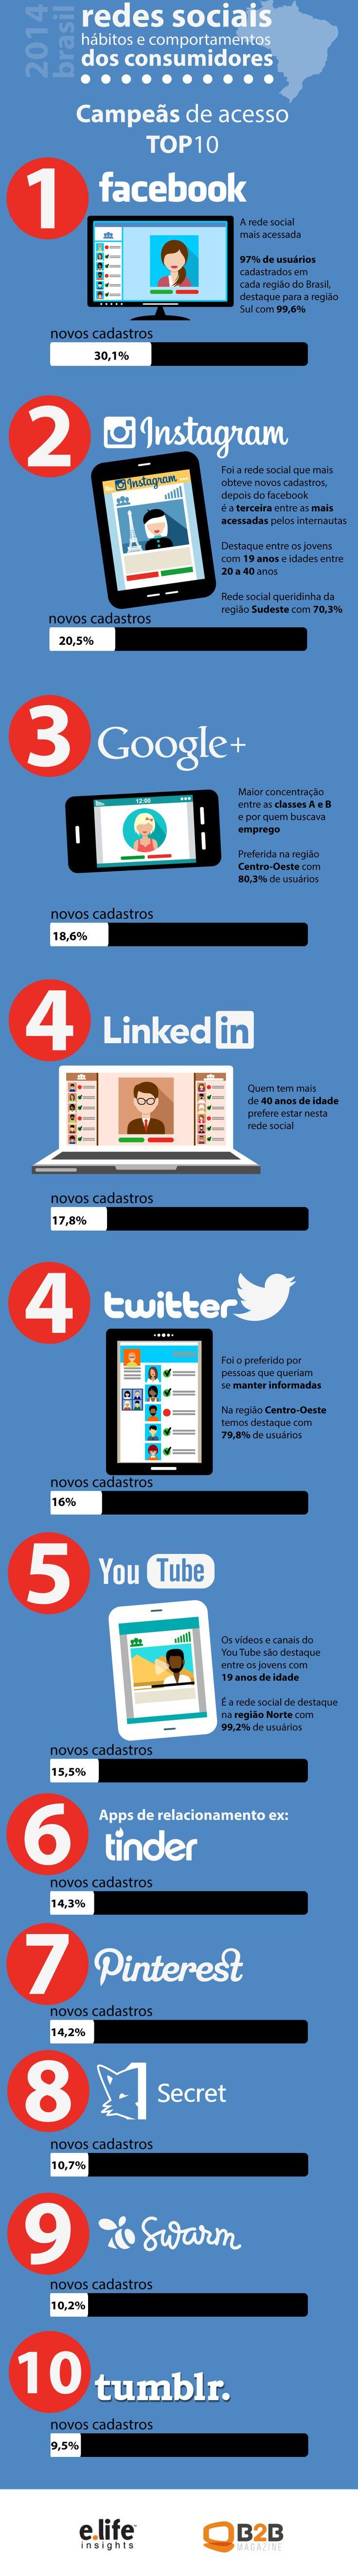 [infográfico] As redes sociais preferidas do brasileiro | Mkt Sem Gravata via:marketingsemgravata #marketindigital #brasil #modernistablog